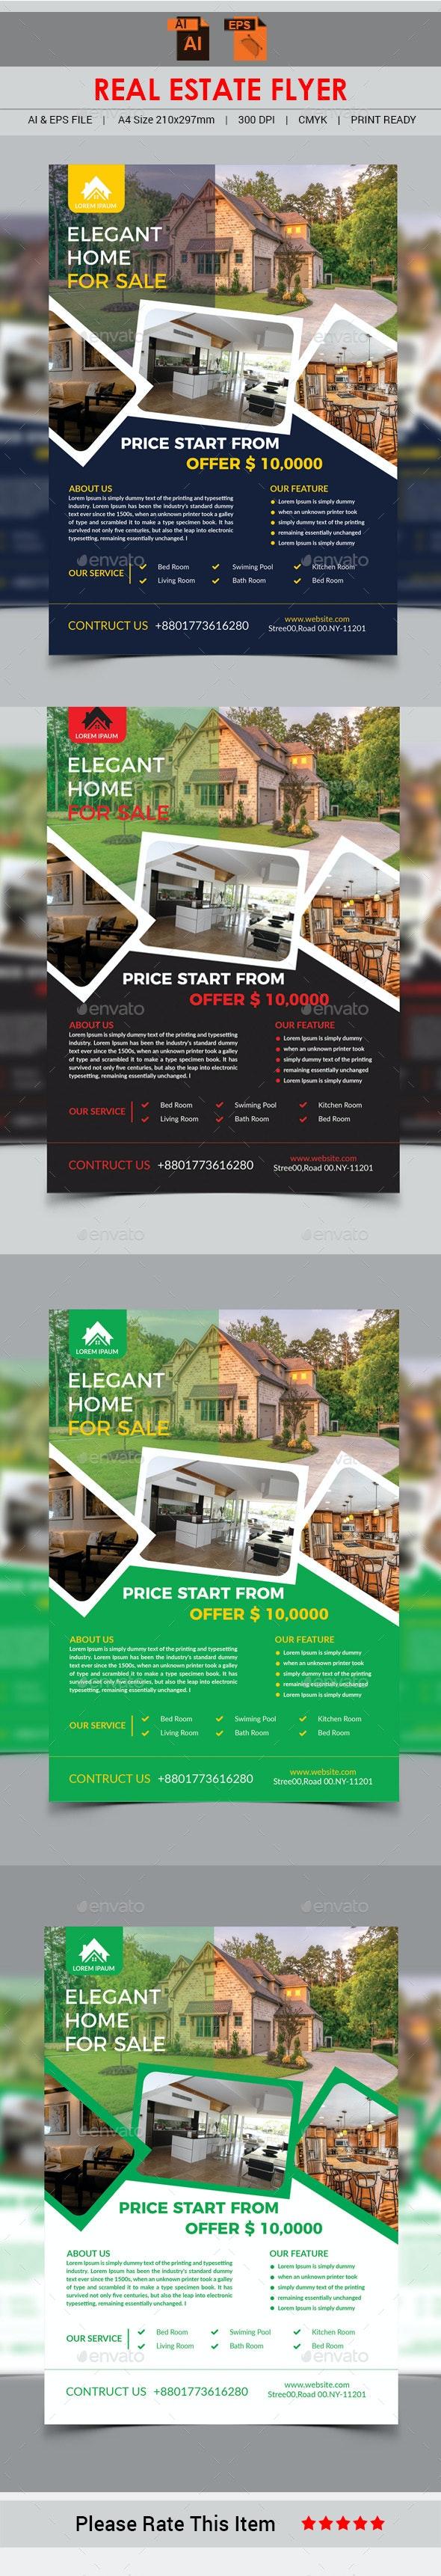 Real Estate Flyer - Print Templates